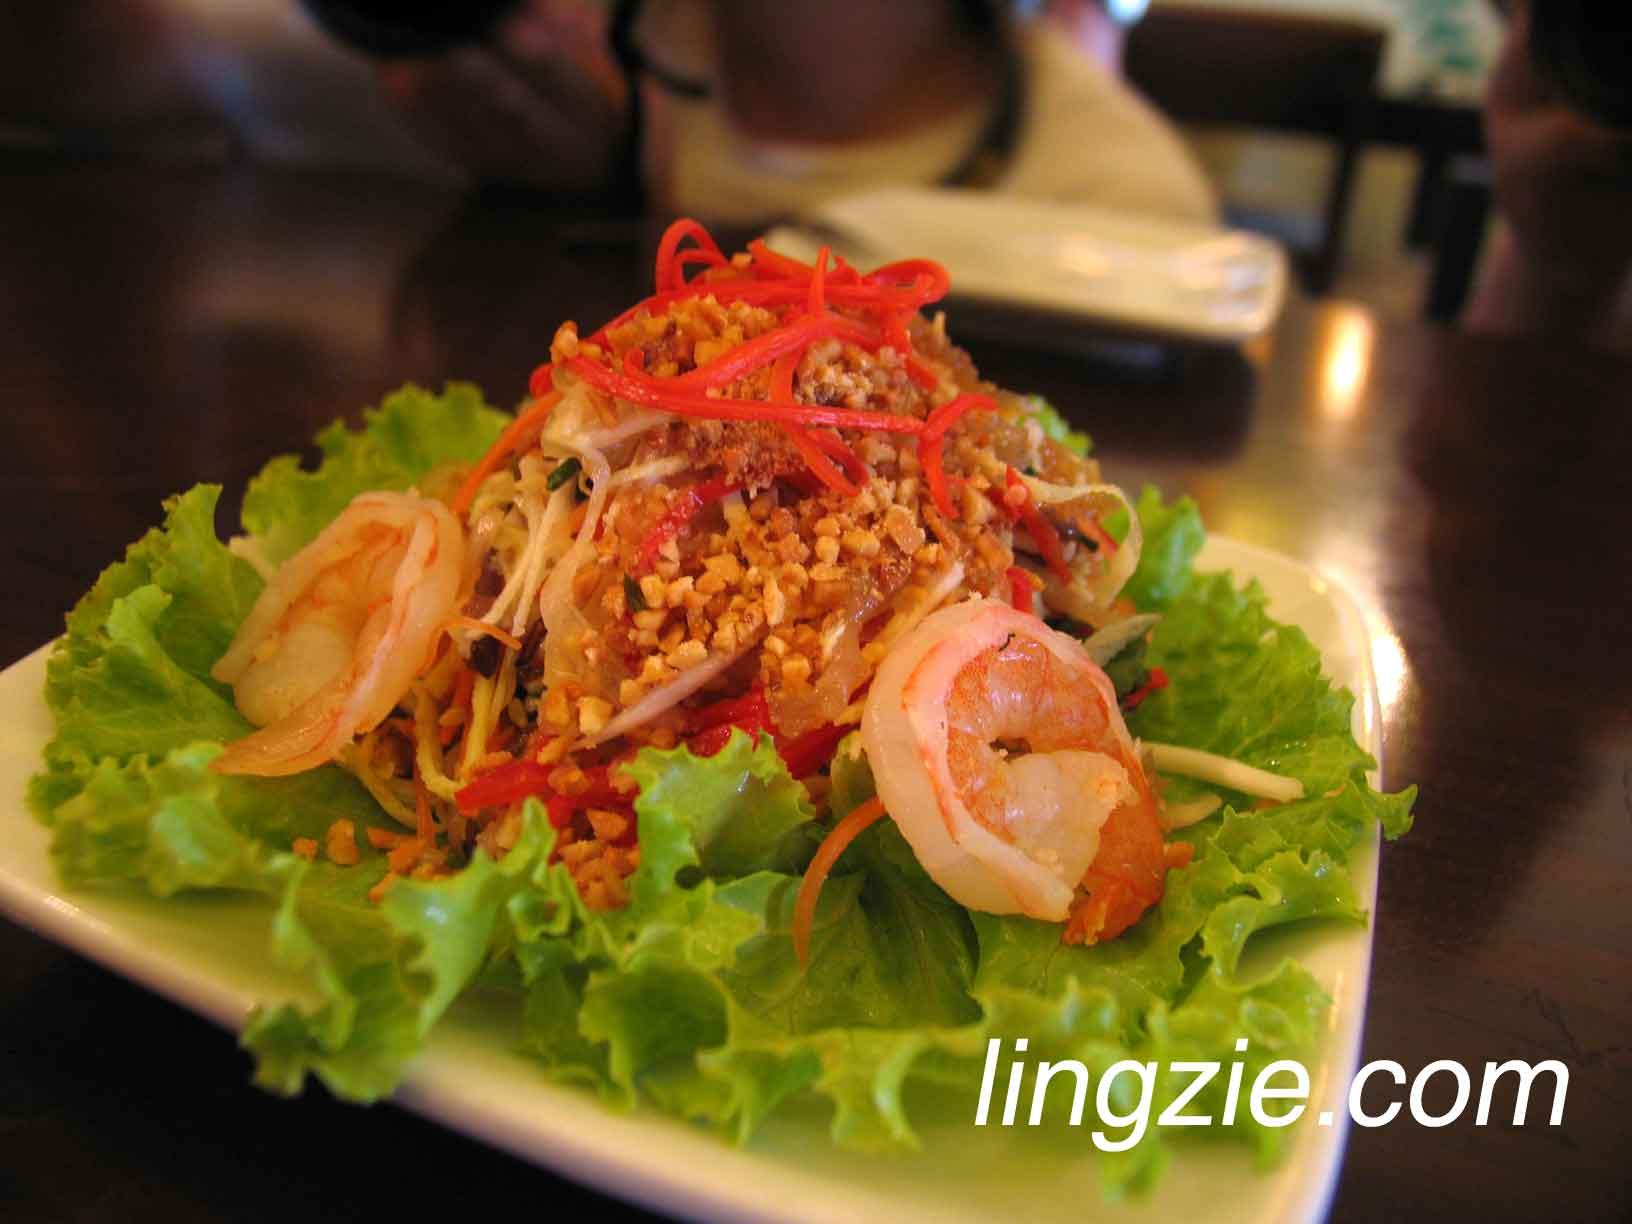 Jellyfish salad (RM8.80)